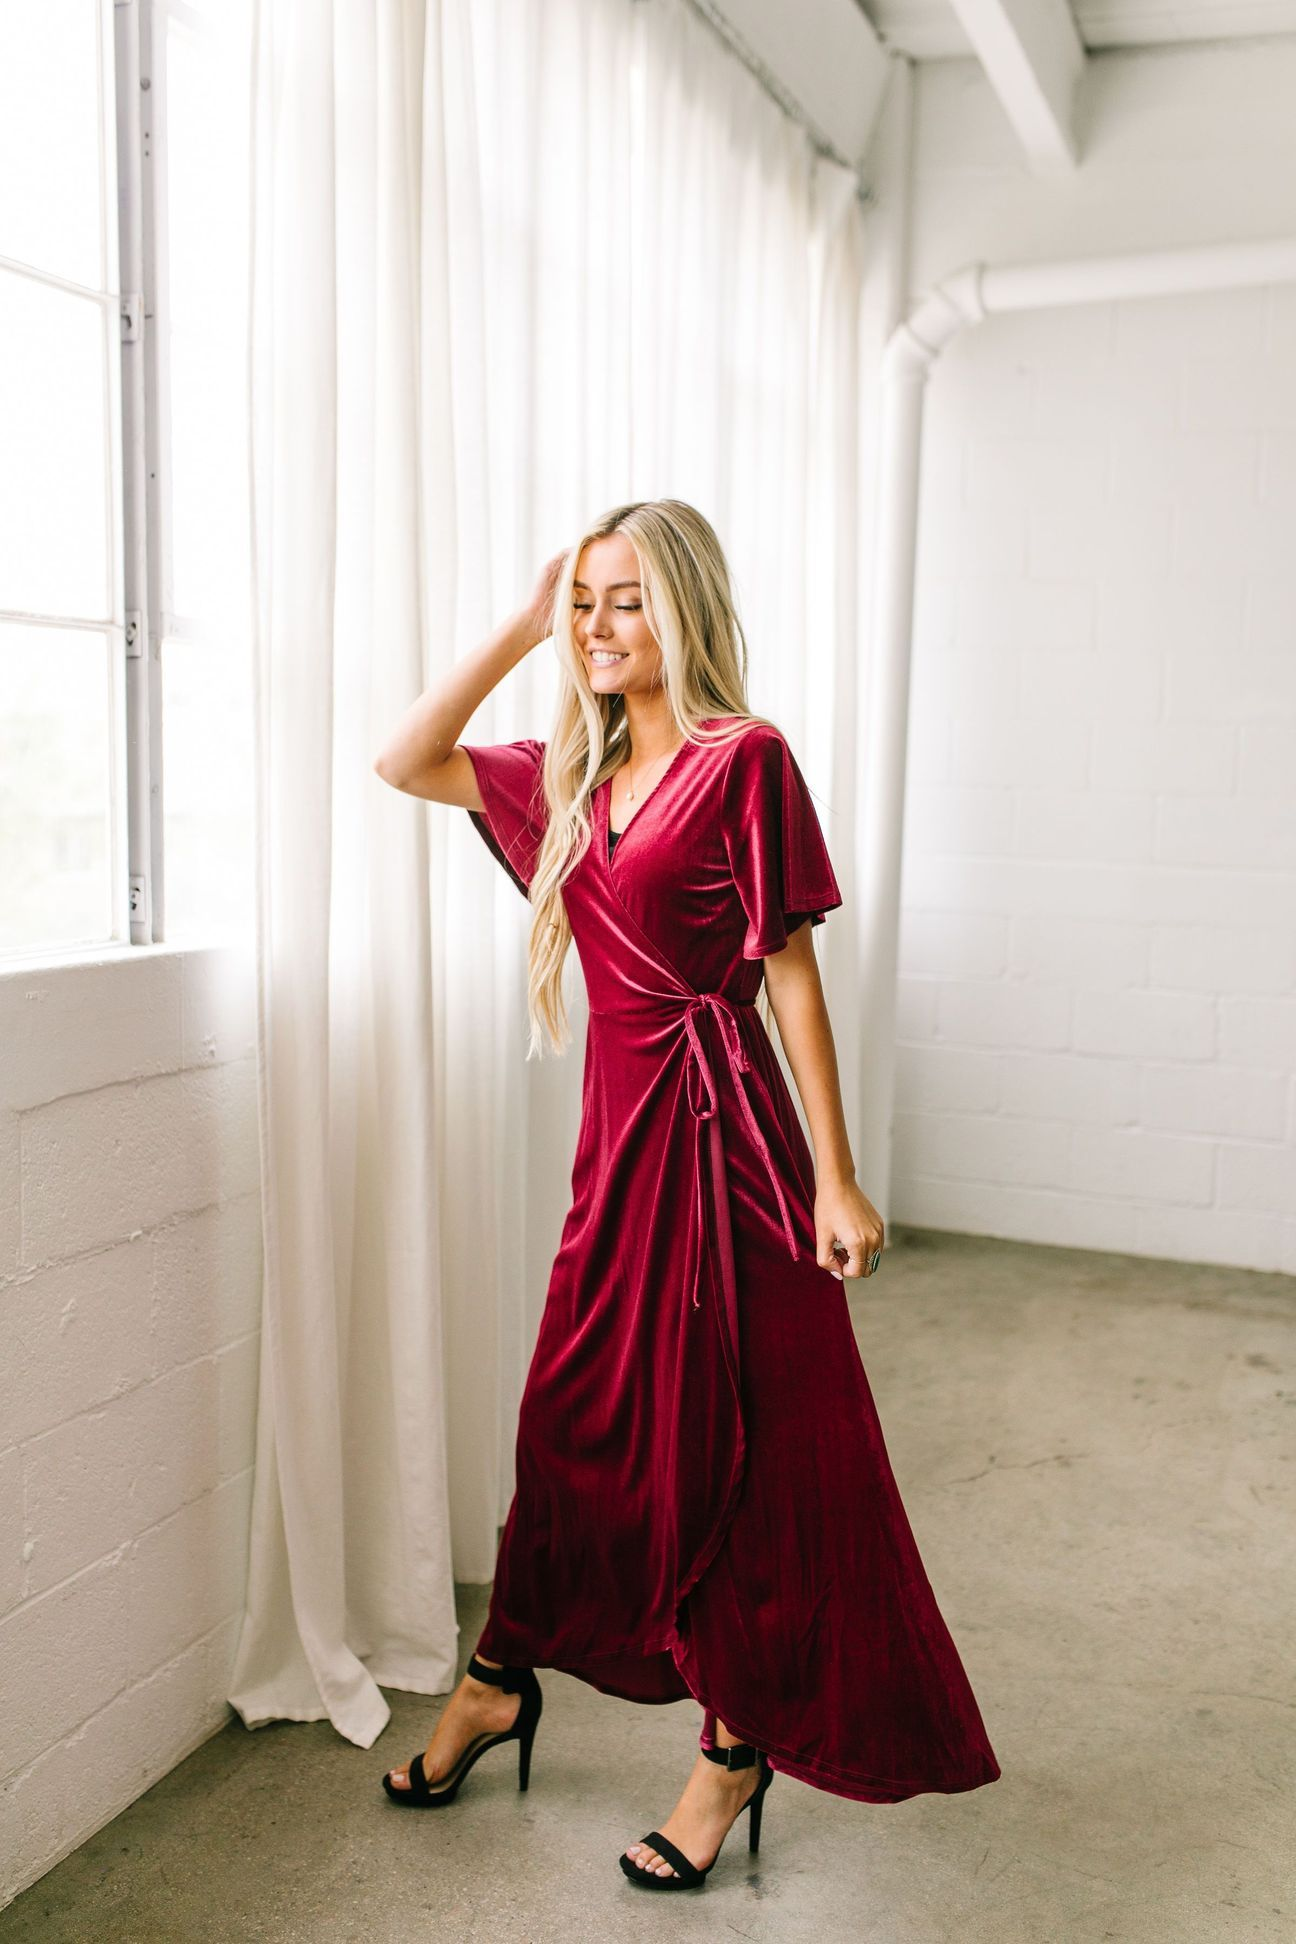 Affordable Winter Wedding Guest Dresses 2018 Under 50 1 Because I